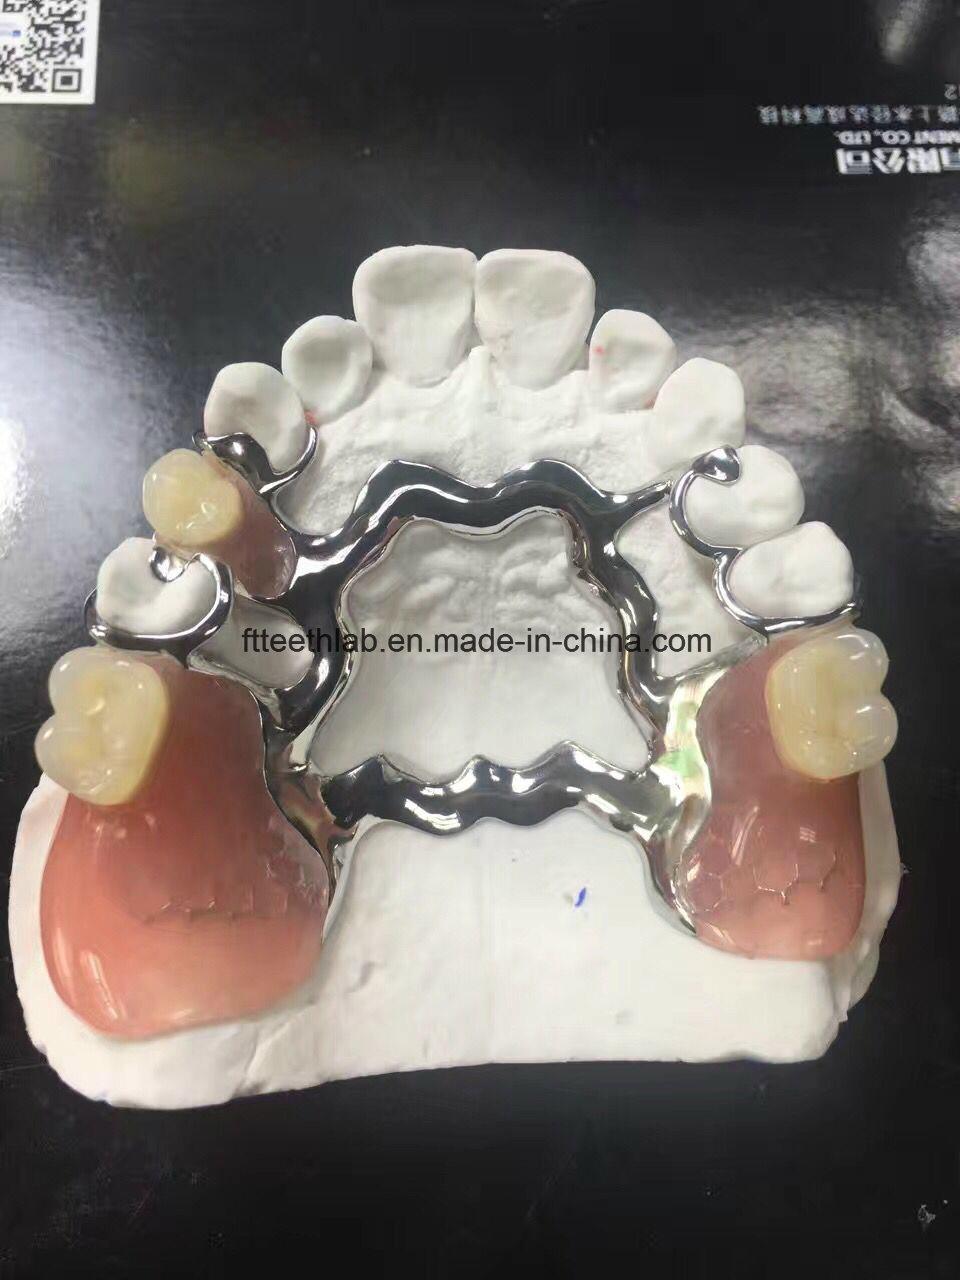 Vitallium Casting Framework Denture